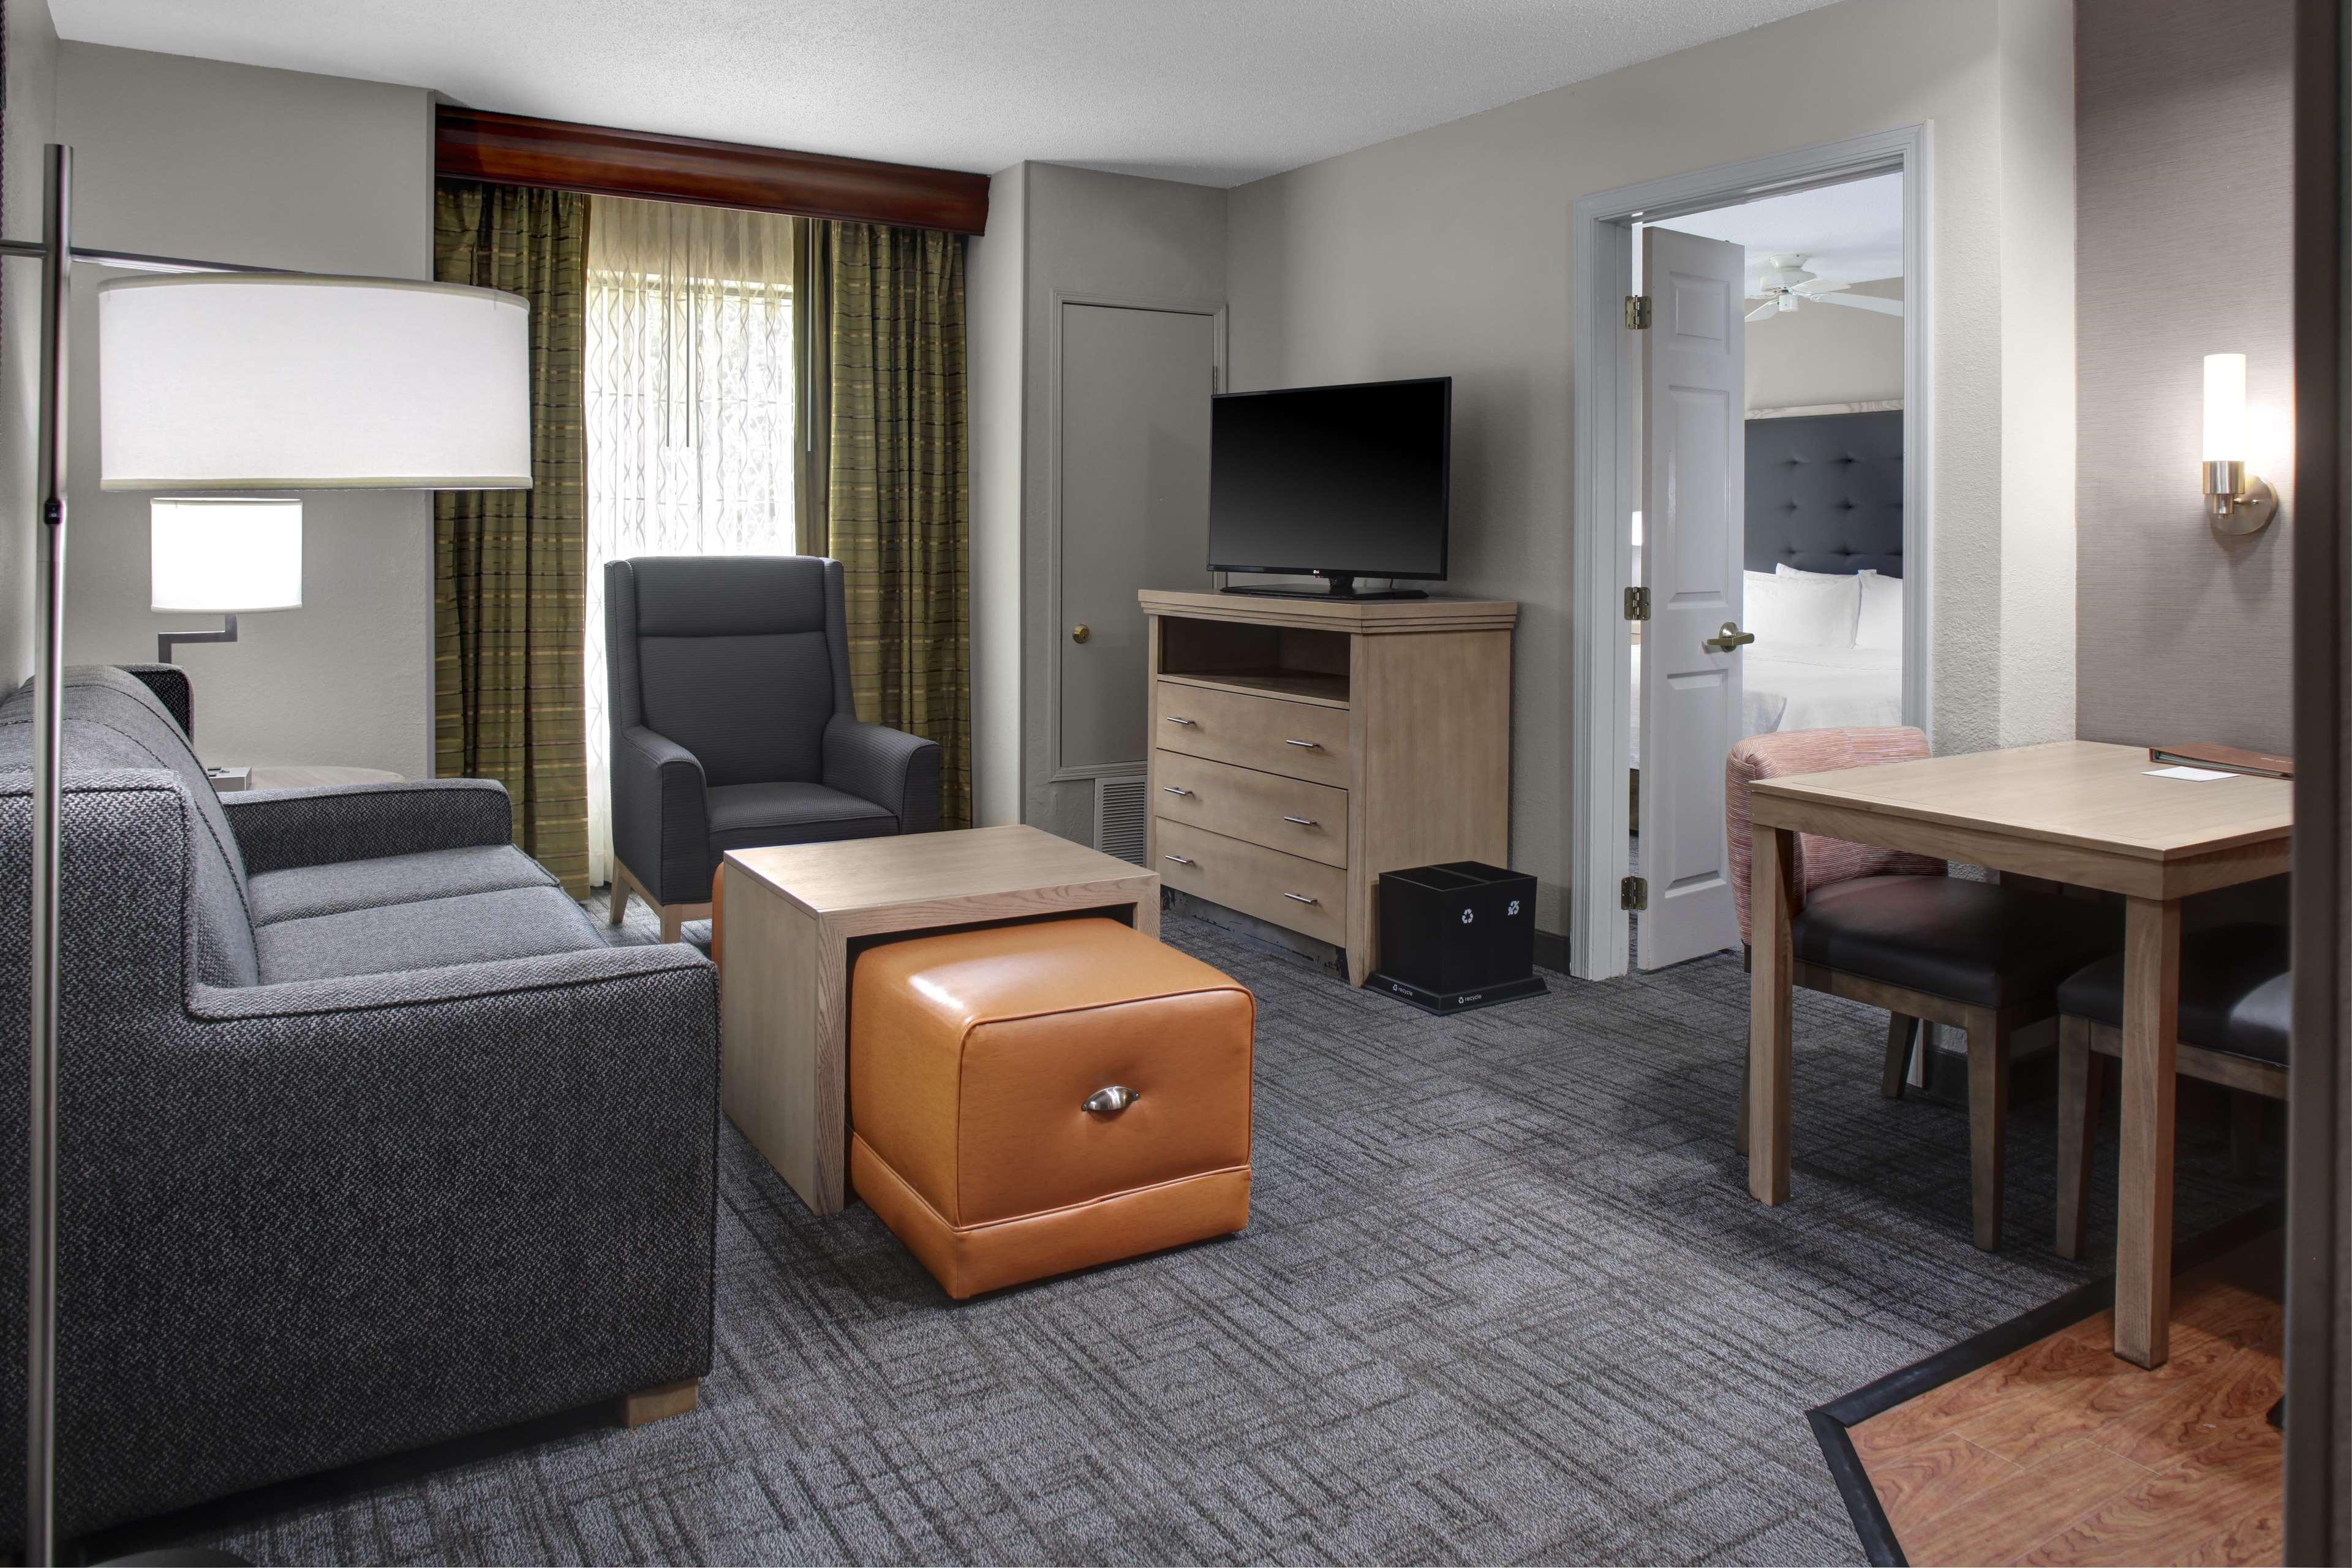 Homewood Suites by Hilton Richmond-West End/Innsbrook image 17